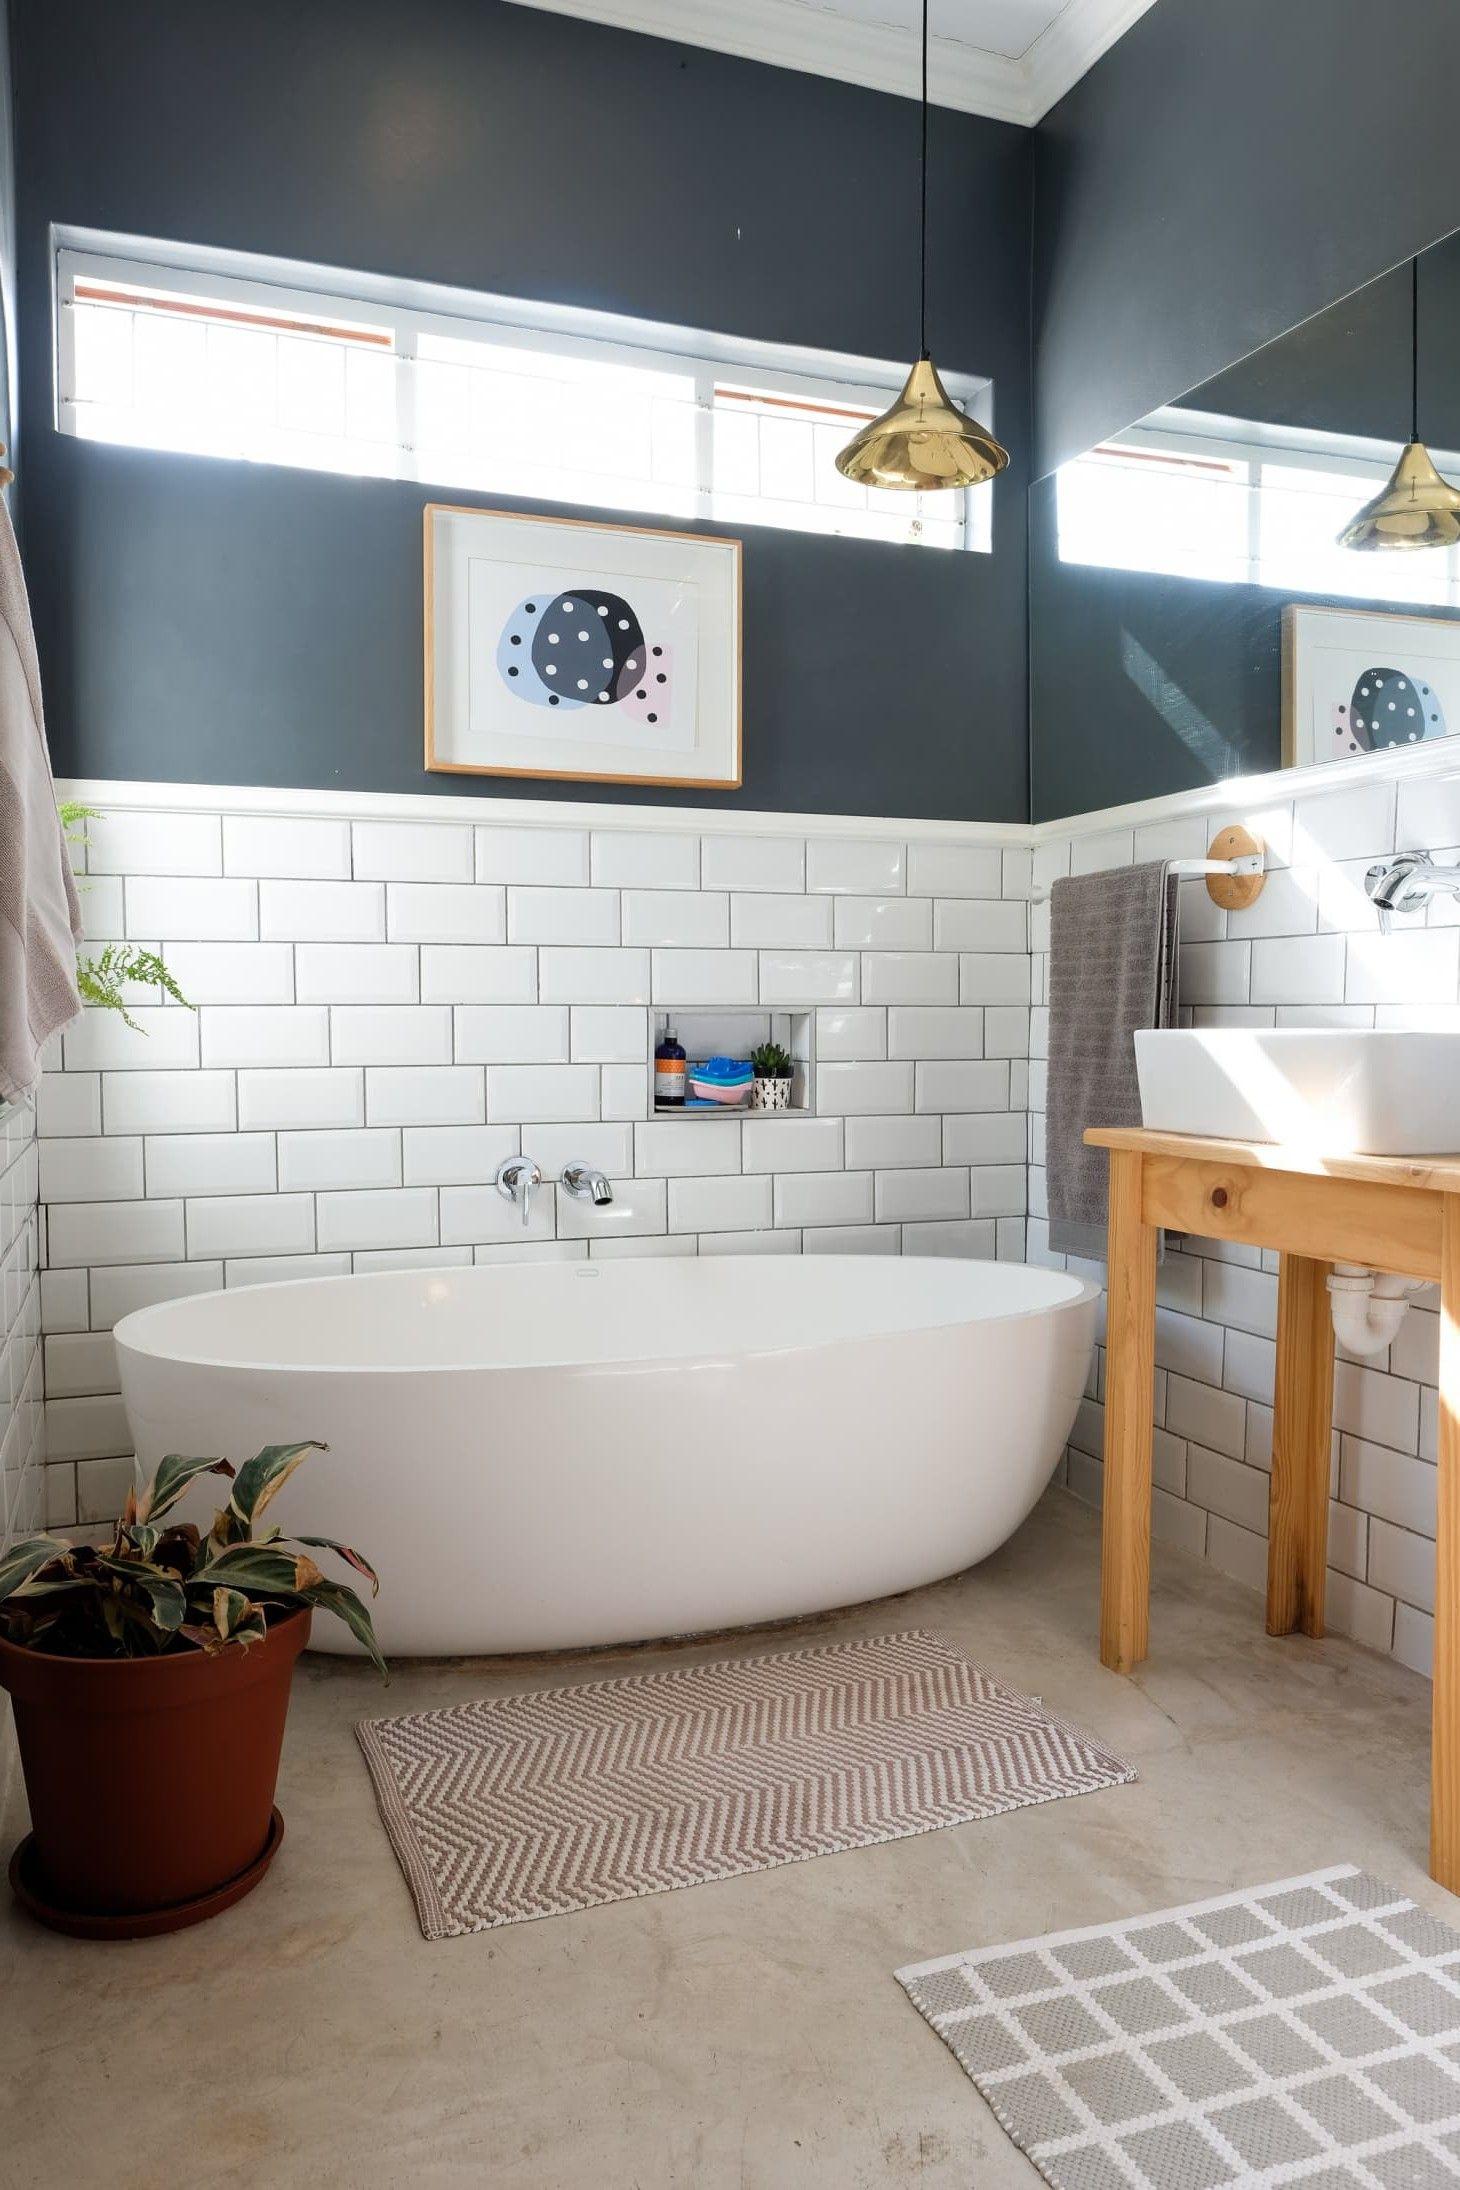 52 simple small apartment bathroom remodel ideas in 2020 on bathroom renovation ideas 2020 id=52085